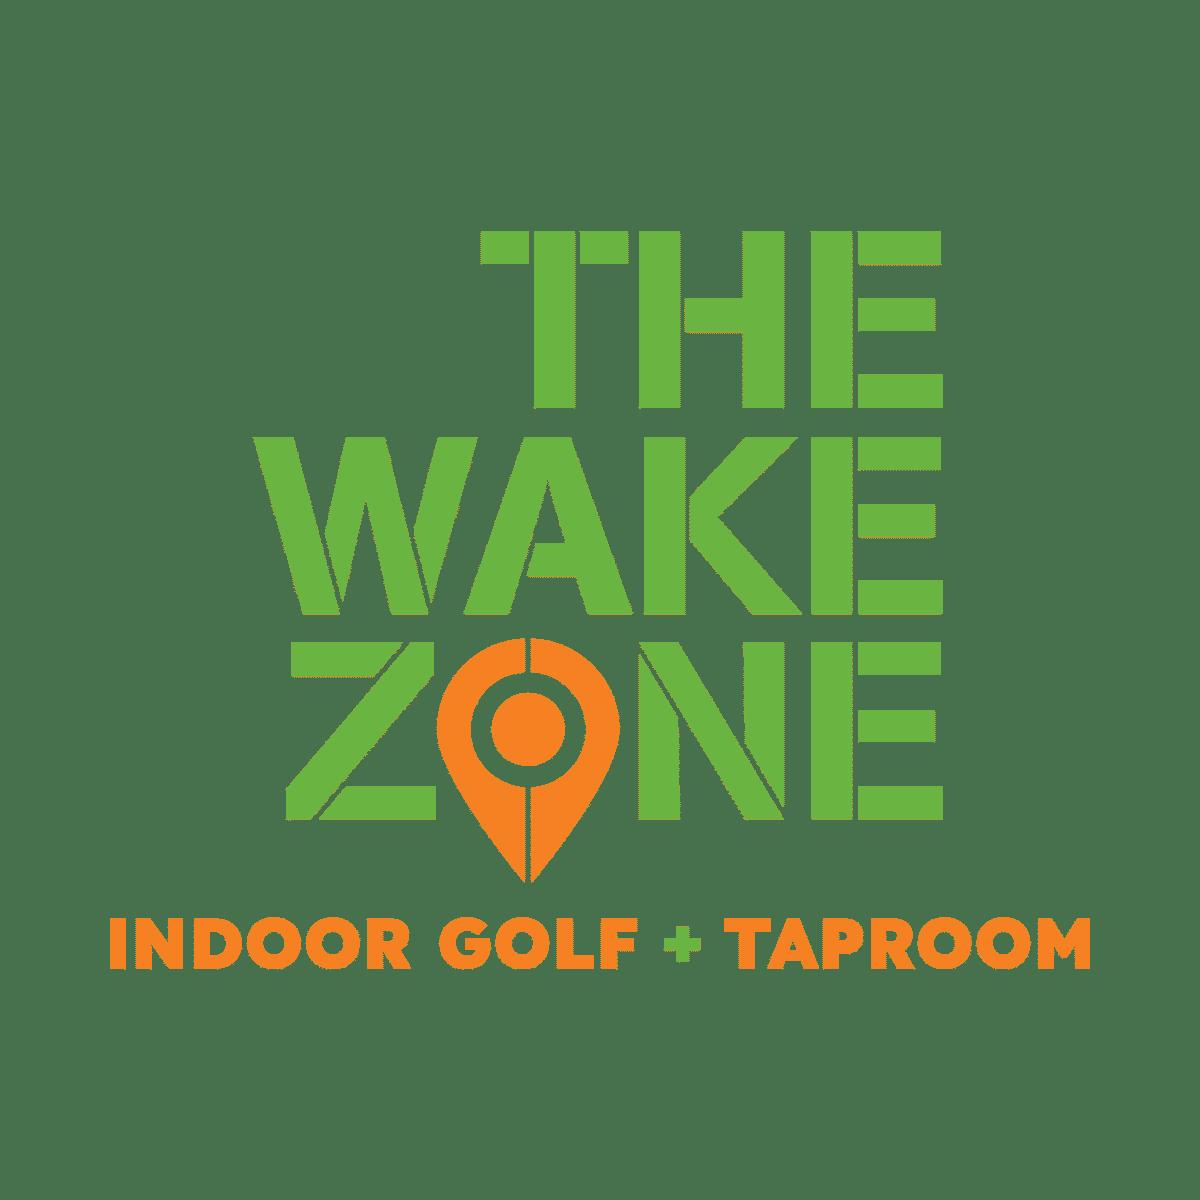 THE WAKE ZONE logo GREEN+ORANGE